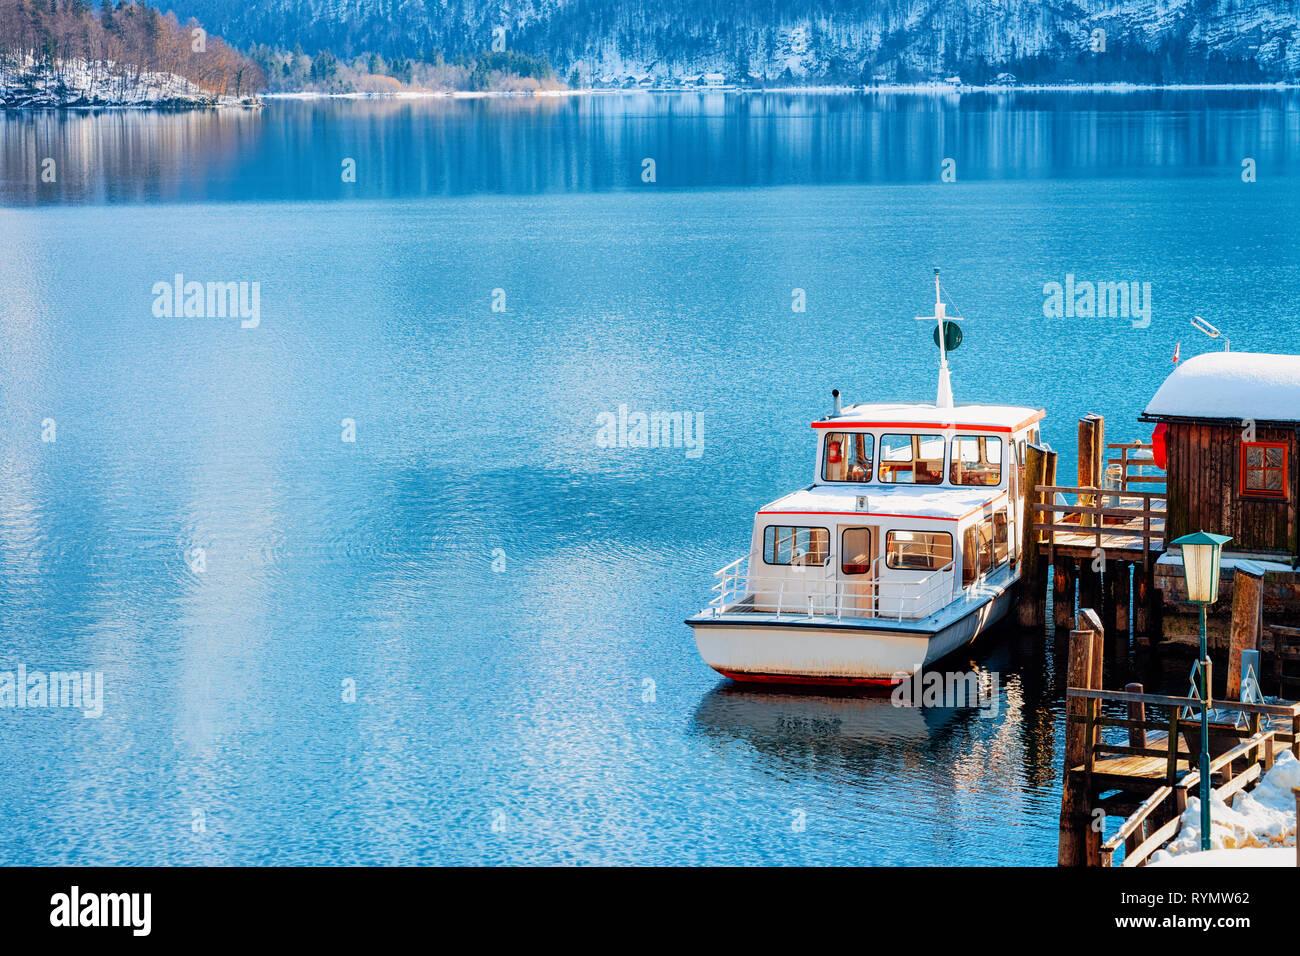 Touristic ferry on Hallstatt Lake near Salzburg in Austria, Europe. Winter in Salzkammergut. Travel to Austrian city with lake at Christmas. Alpine La Stock Photo